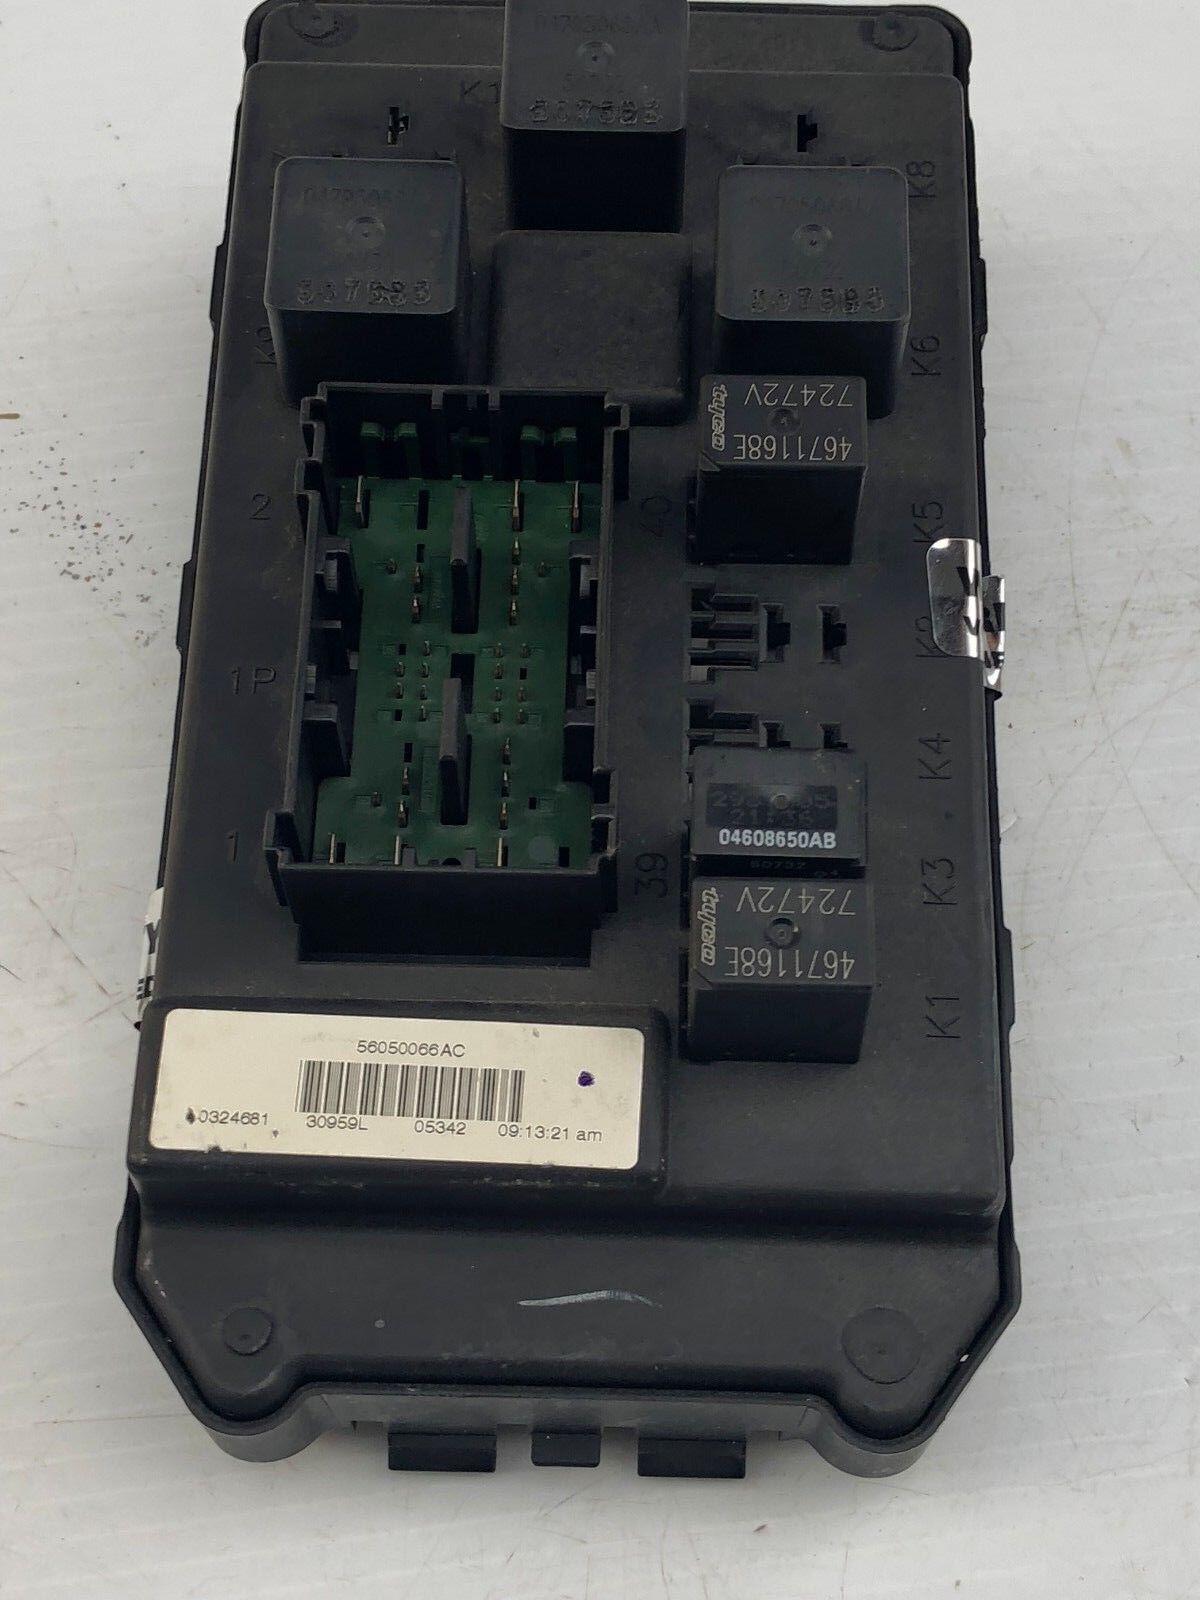 2006 Jeep Commander Grand Cherokee Fuse Box Relay Control Module 56050066AC OEM